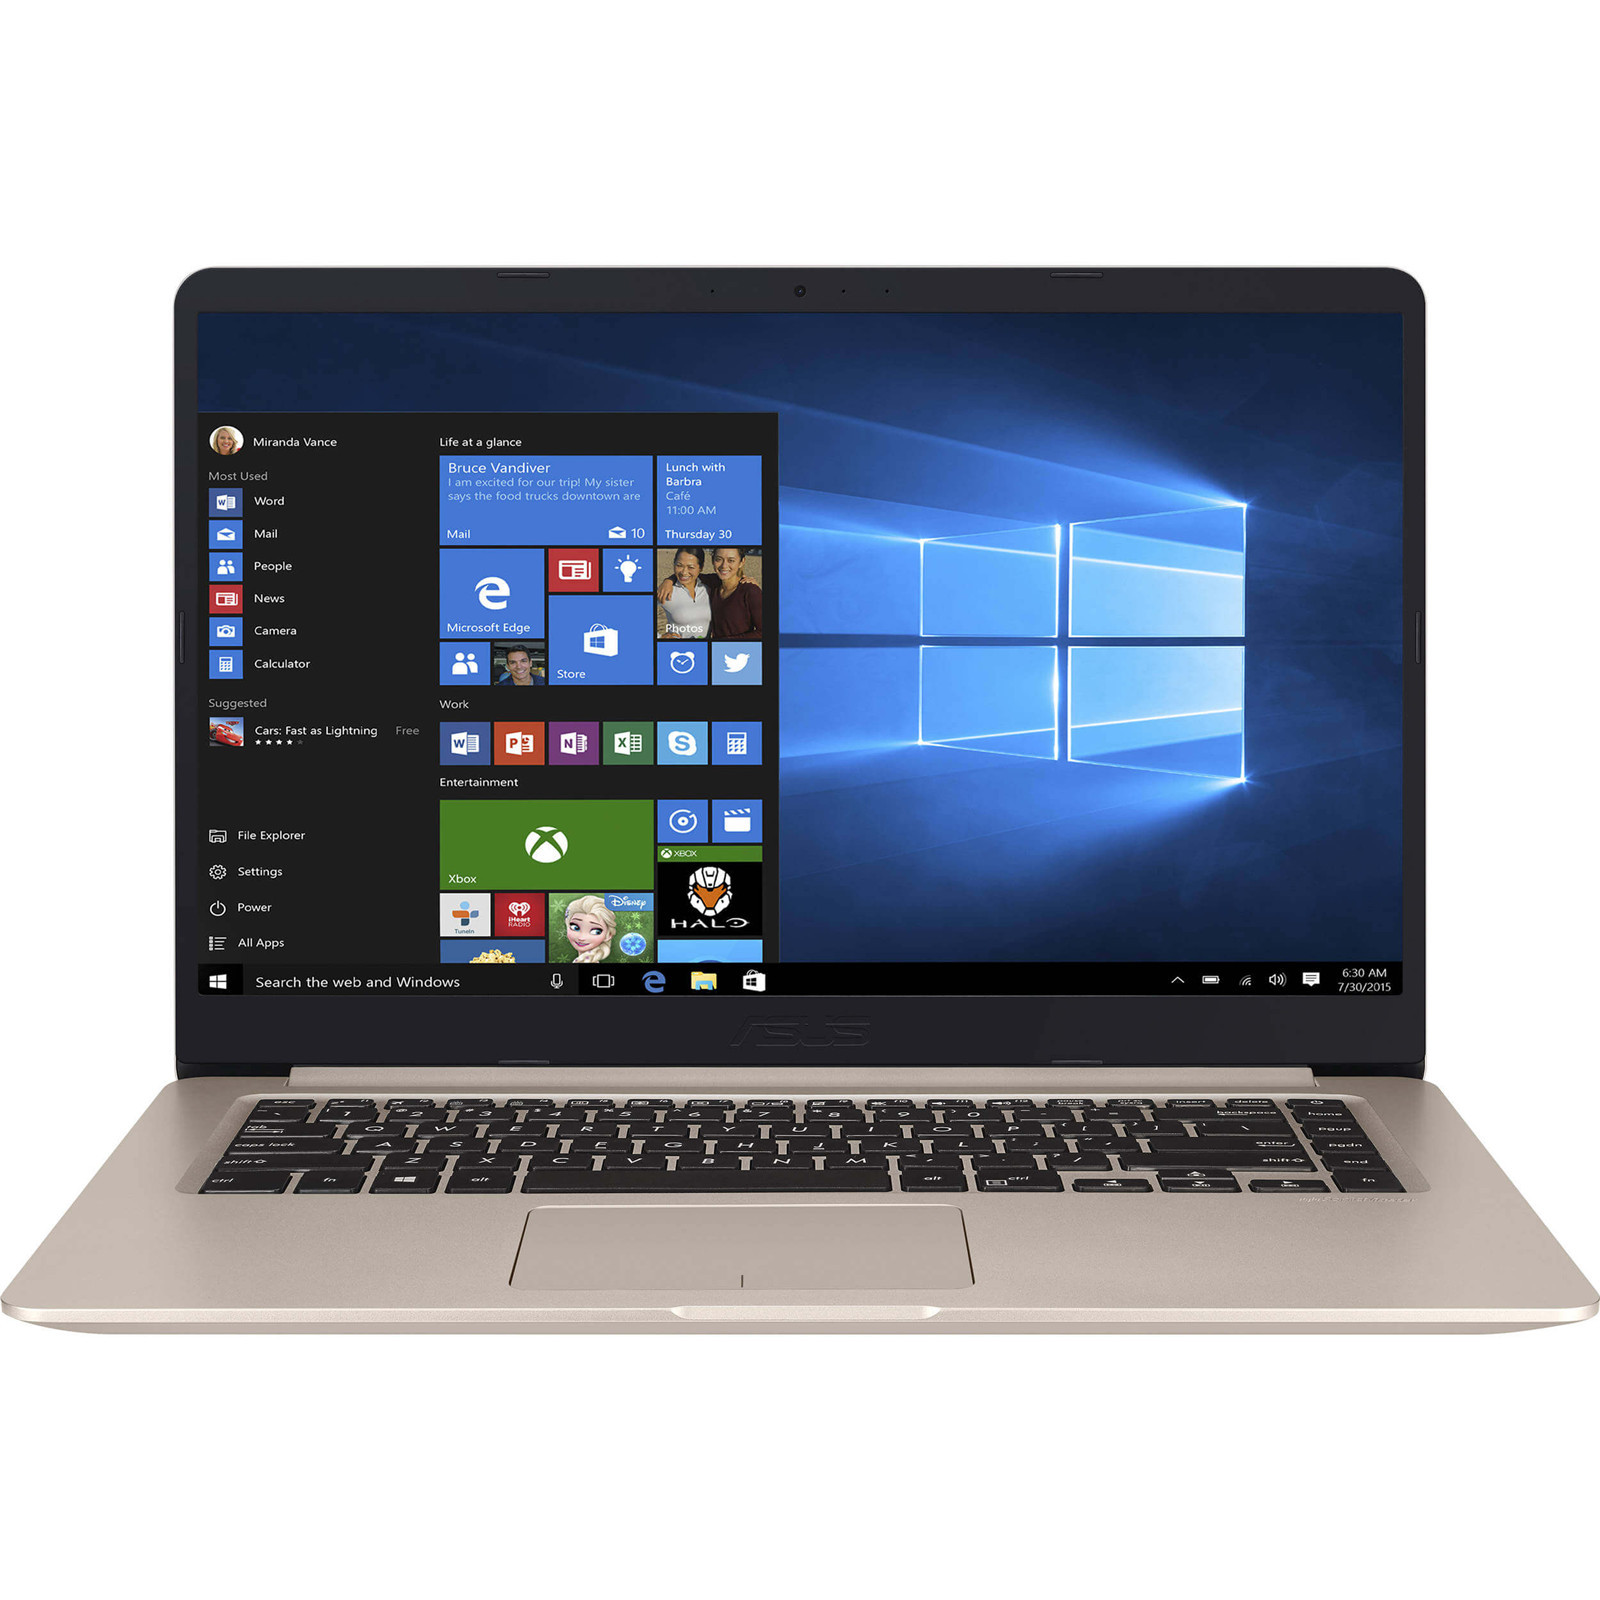 Buy Lights Online Nz: Buy The ASUS Vivobook S510UF-BQ371T Slim Light